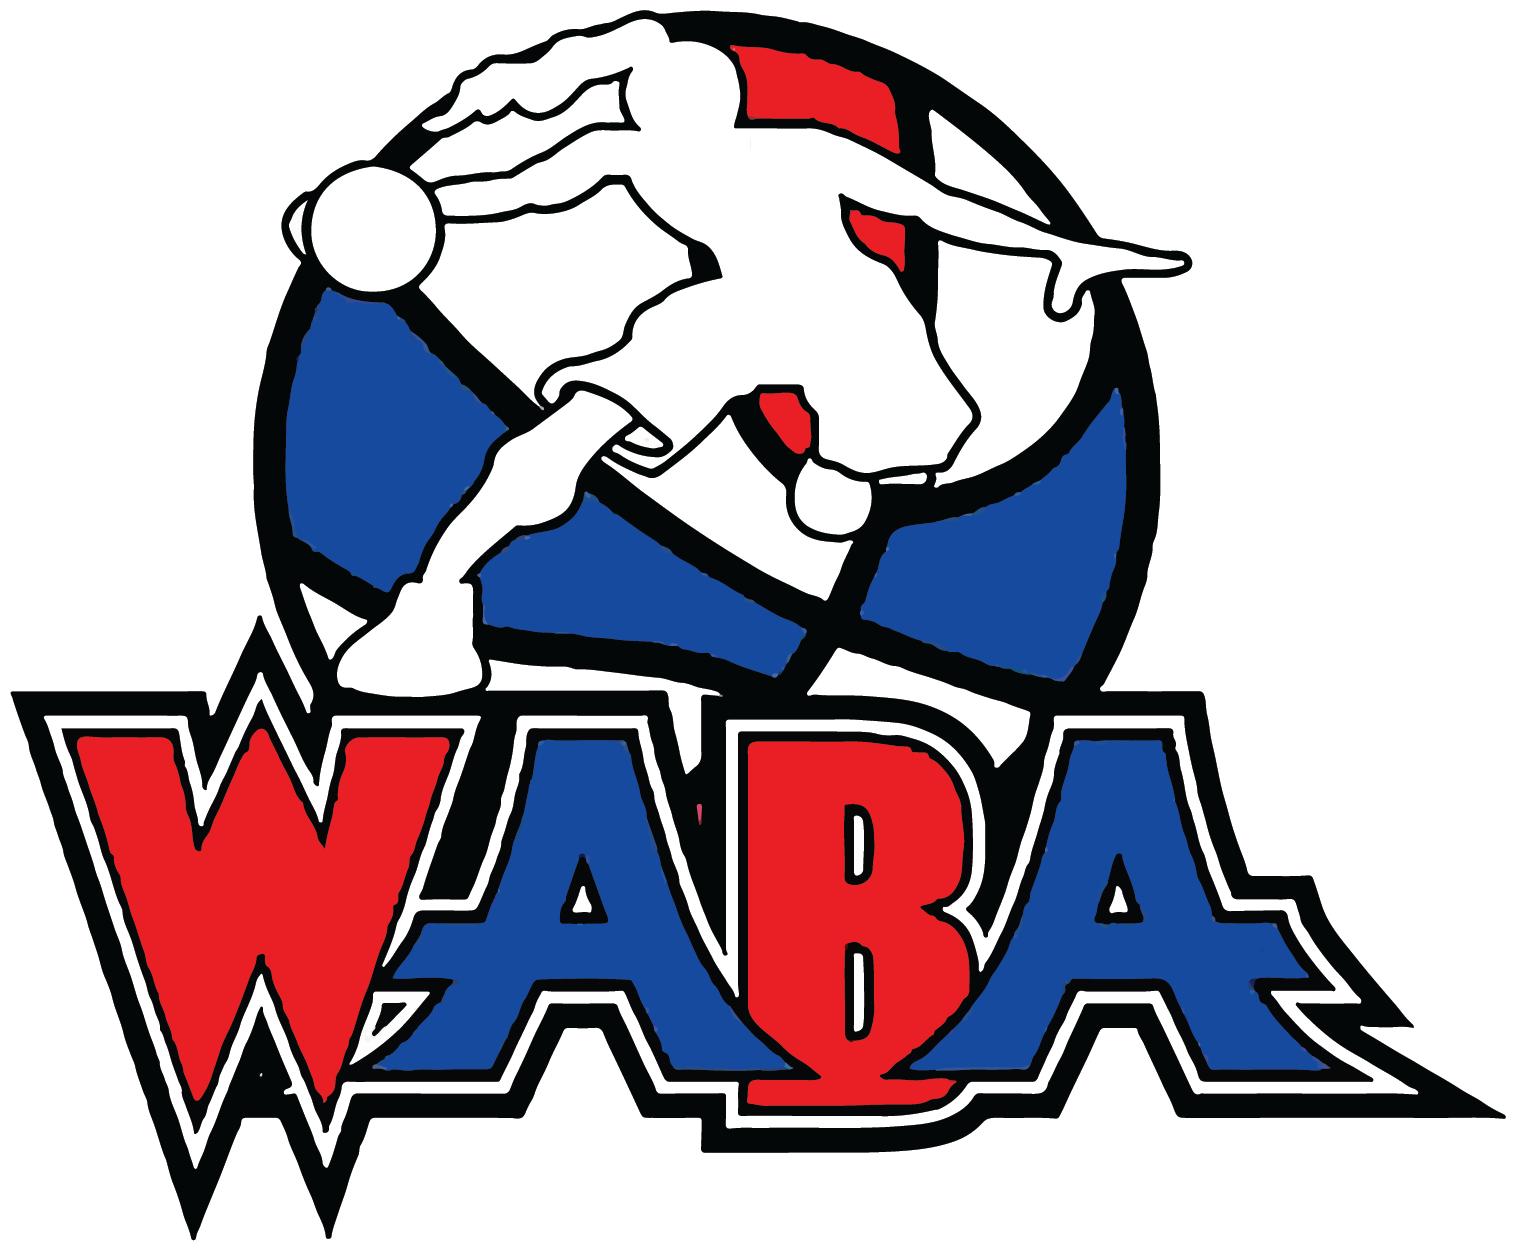 Women's American Basketball Association (WABA)